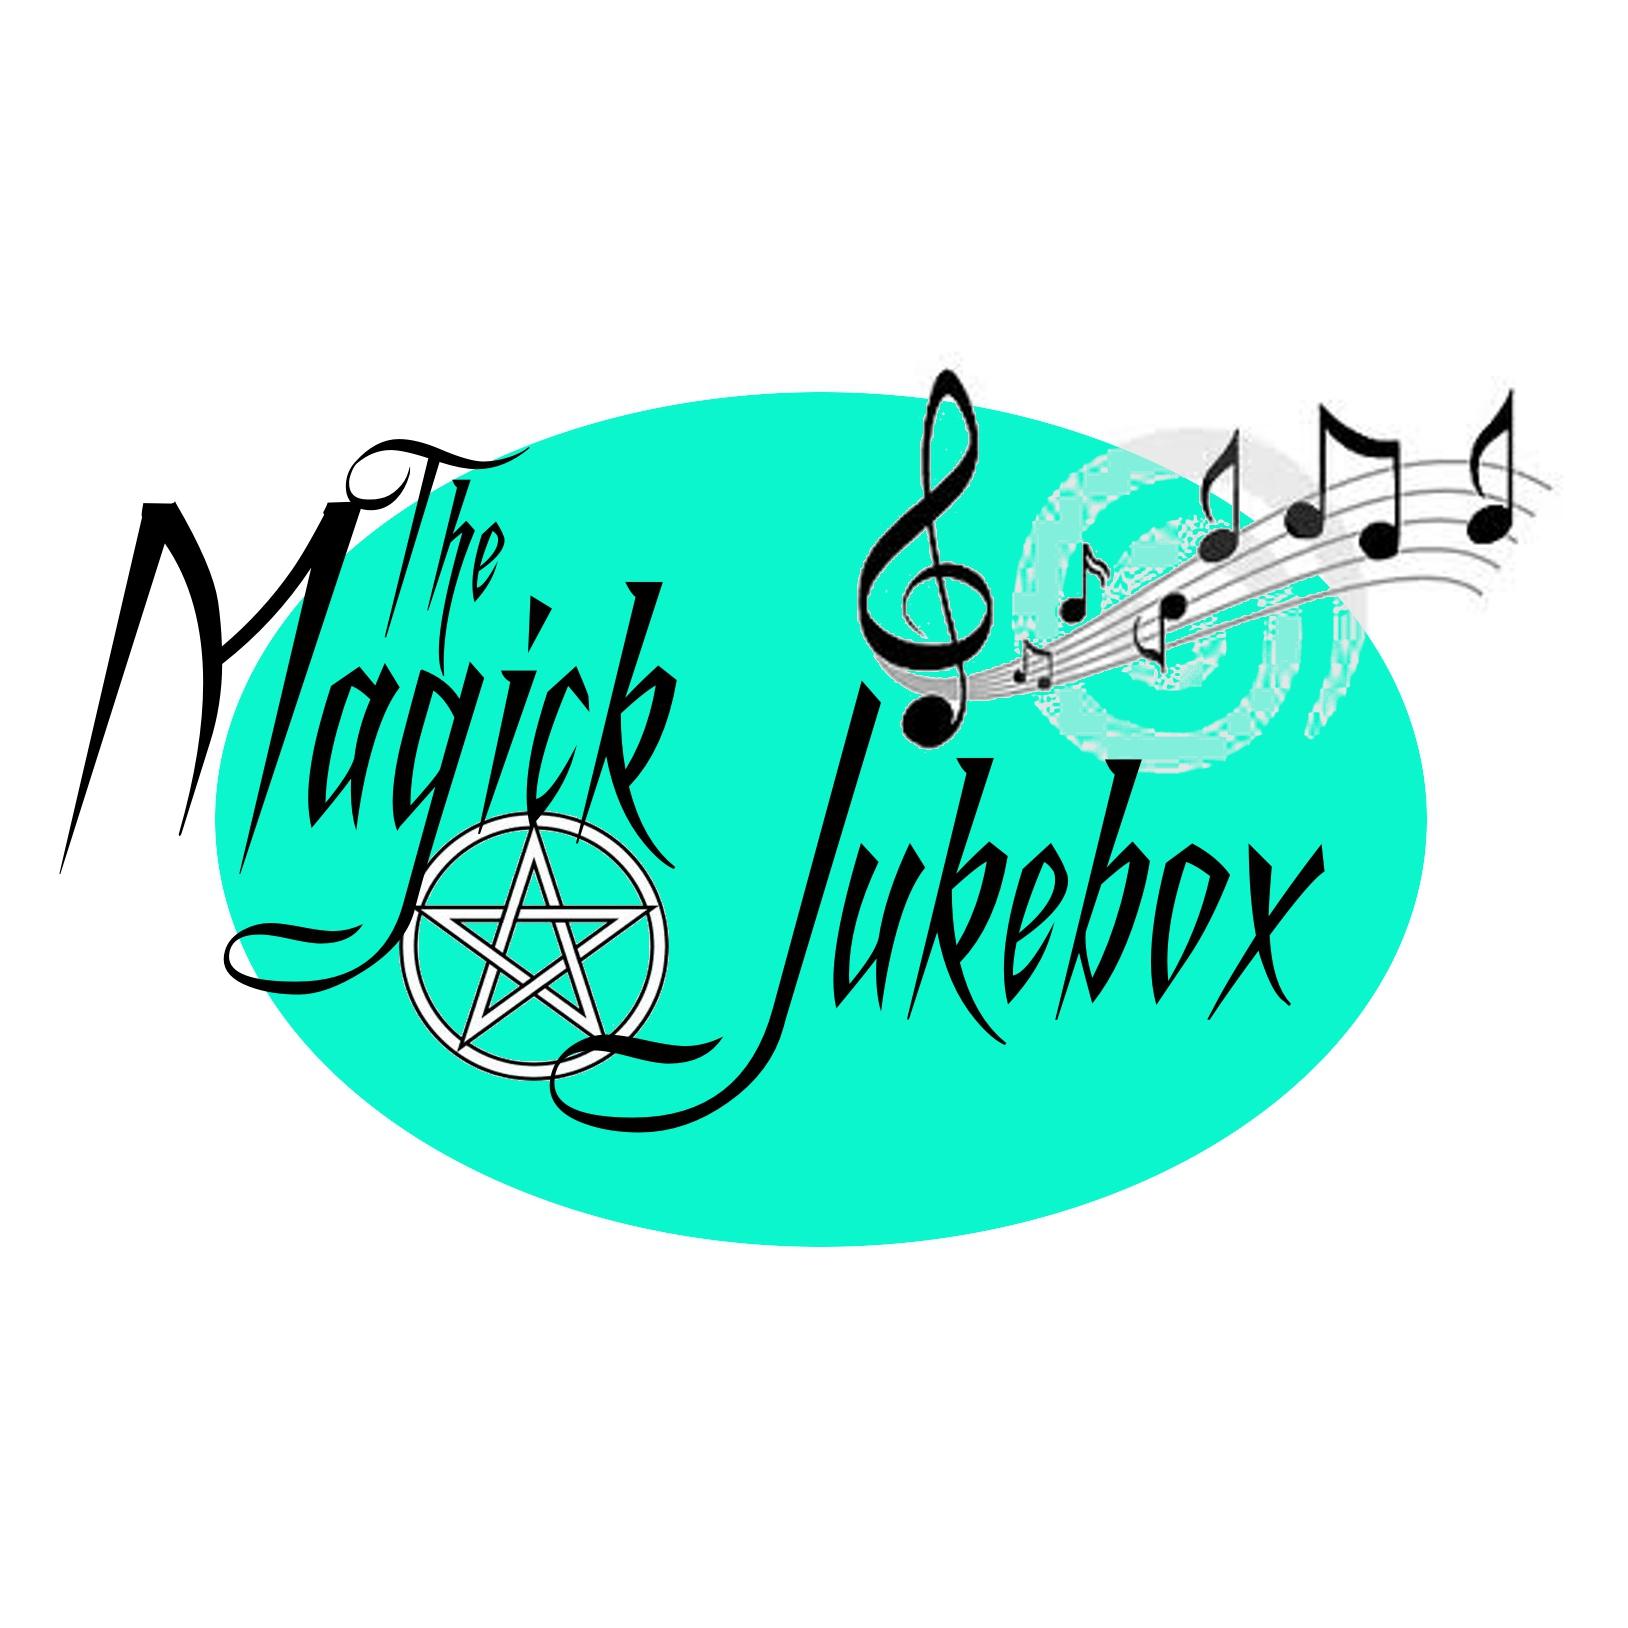 The Magick Jukebox